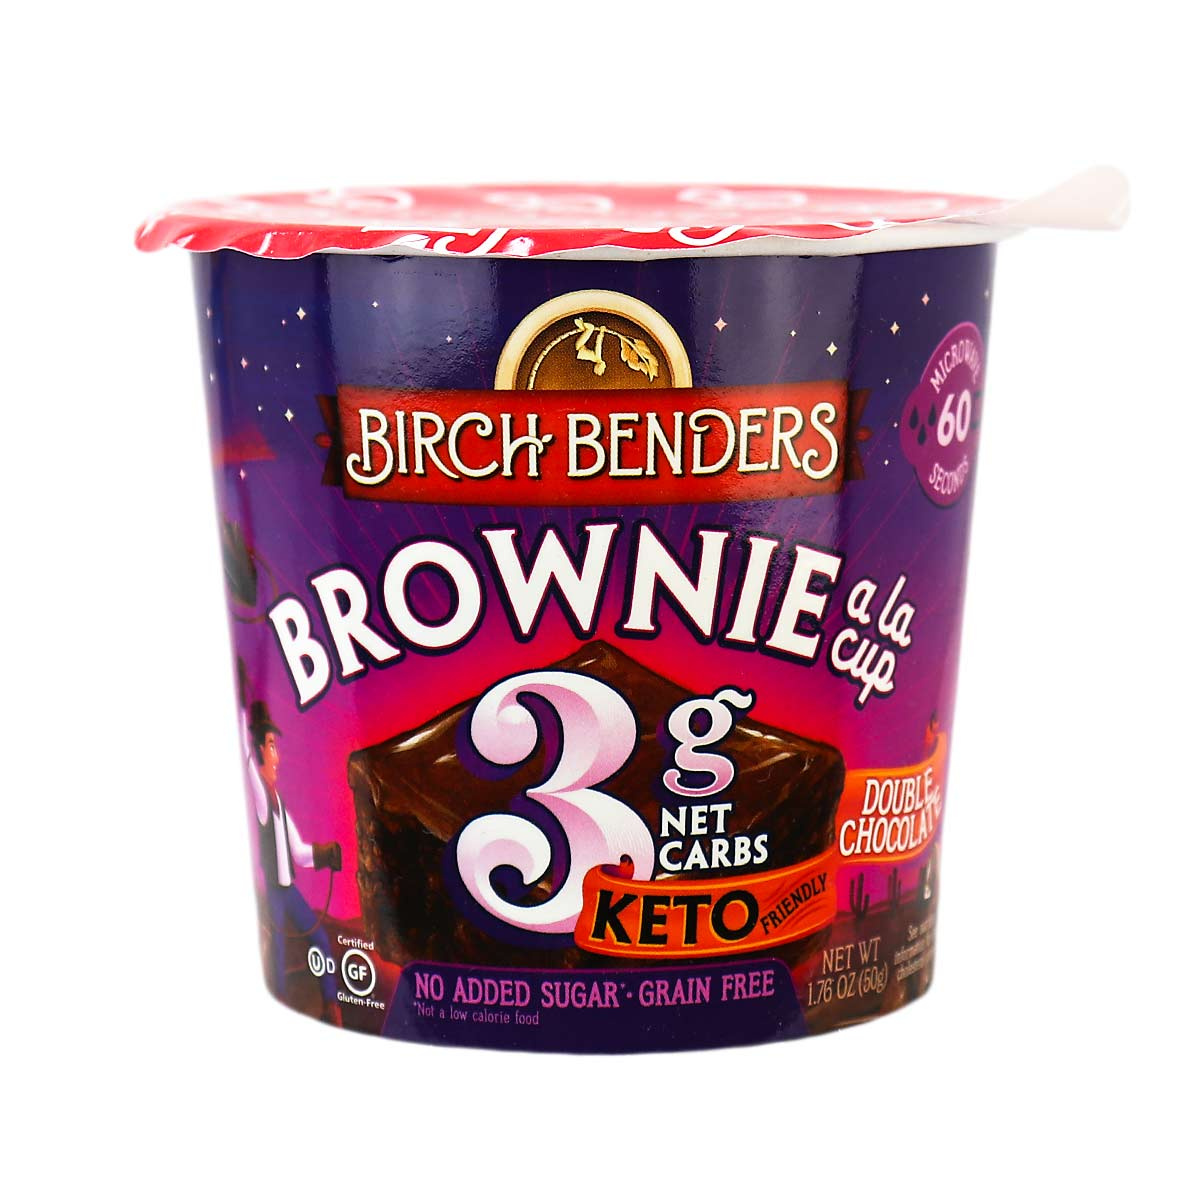 Birch Benders Grain Free Keto Brownie A La Cup Double Chocolate In Canada No Added Sugar Gluten Free Microwavable Mug Cake Naturamarket Ca